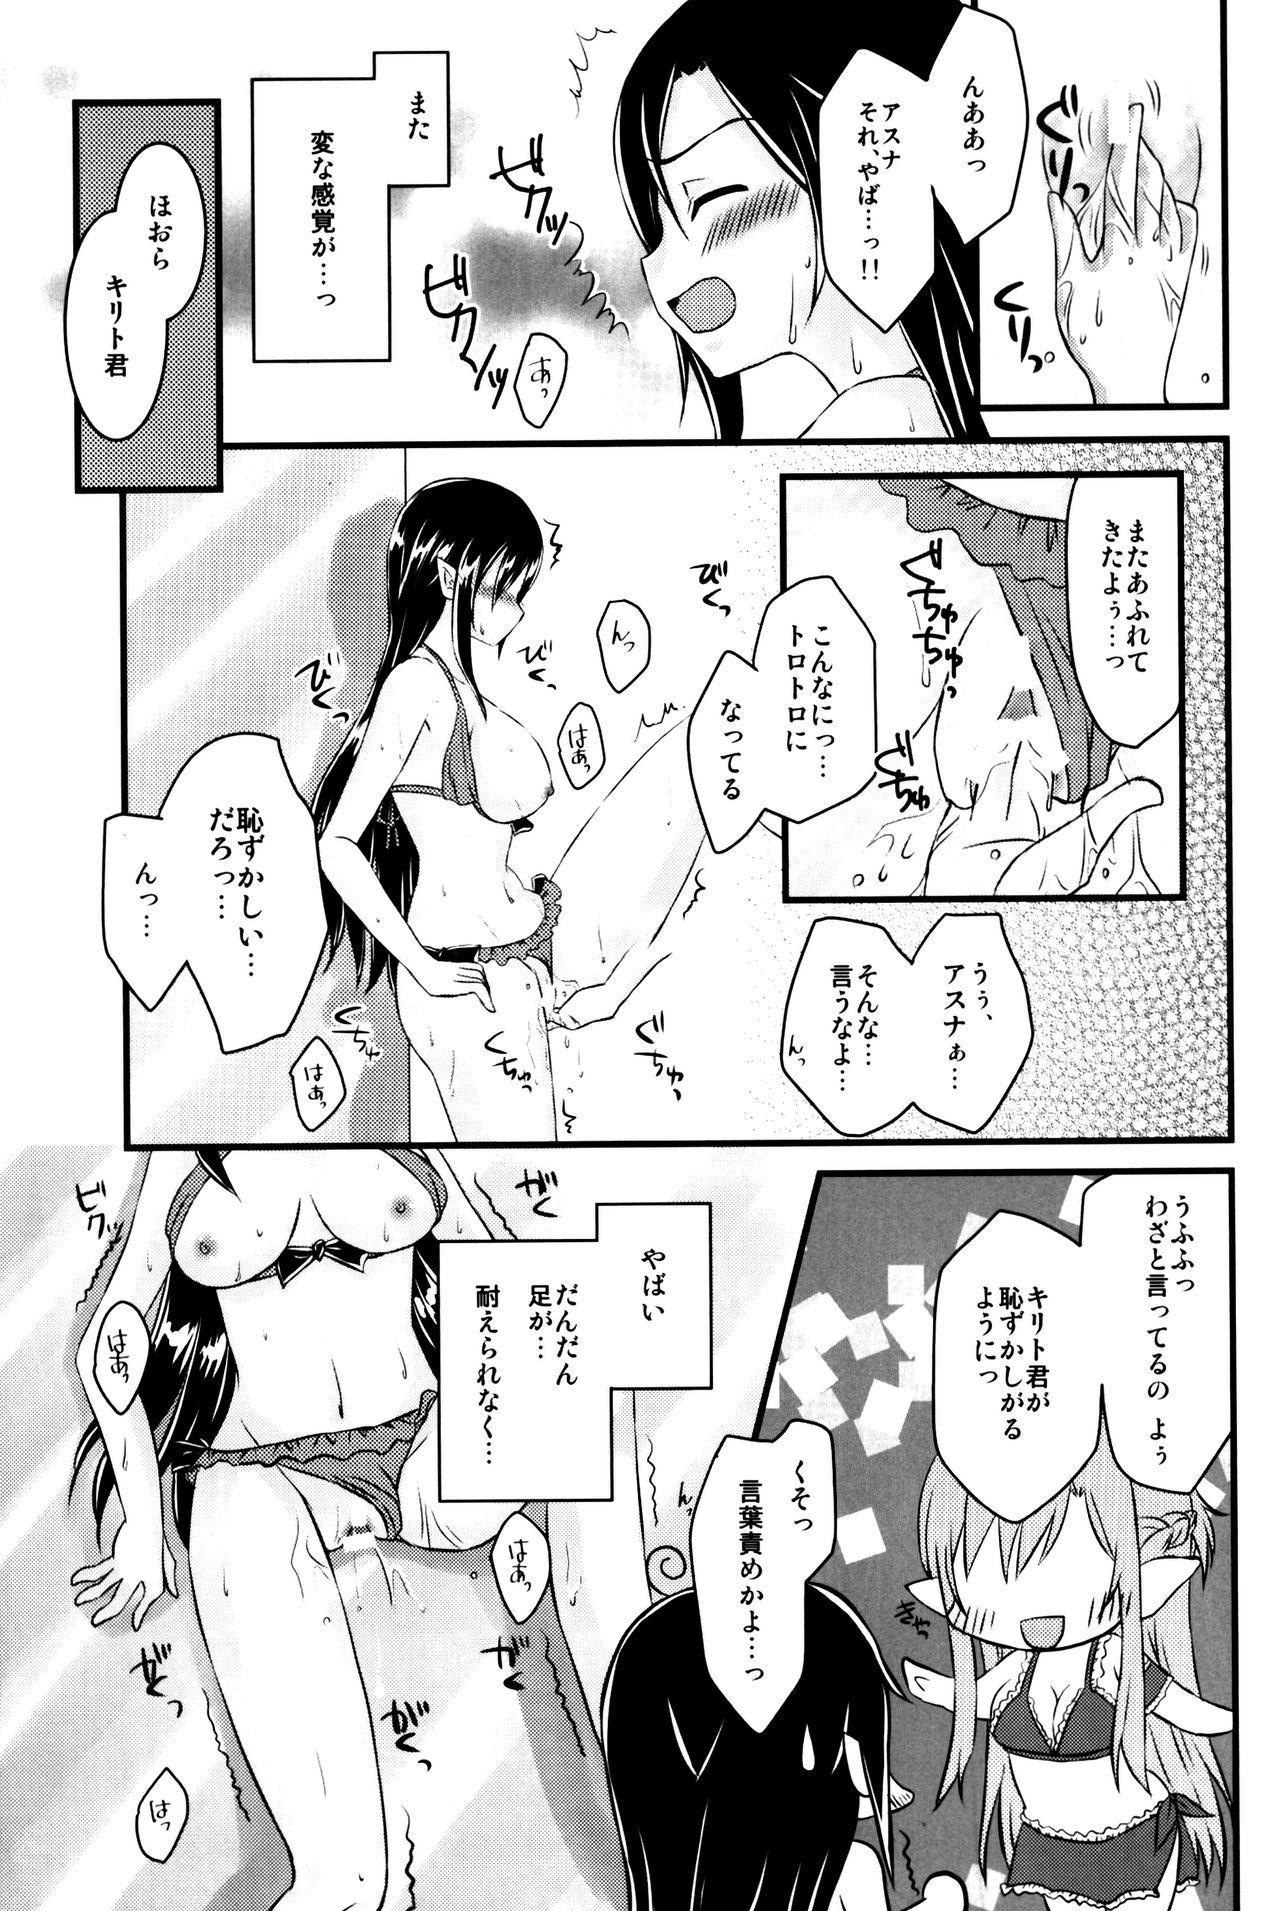 Kiriko-chan to Asobou! 3 9